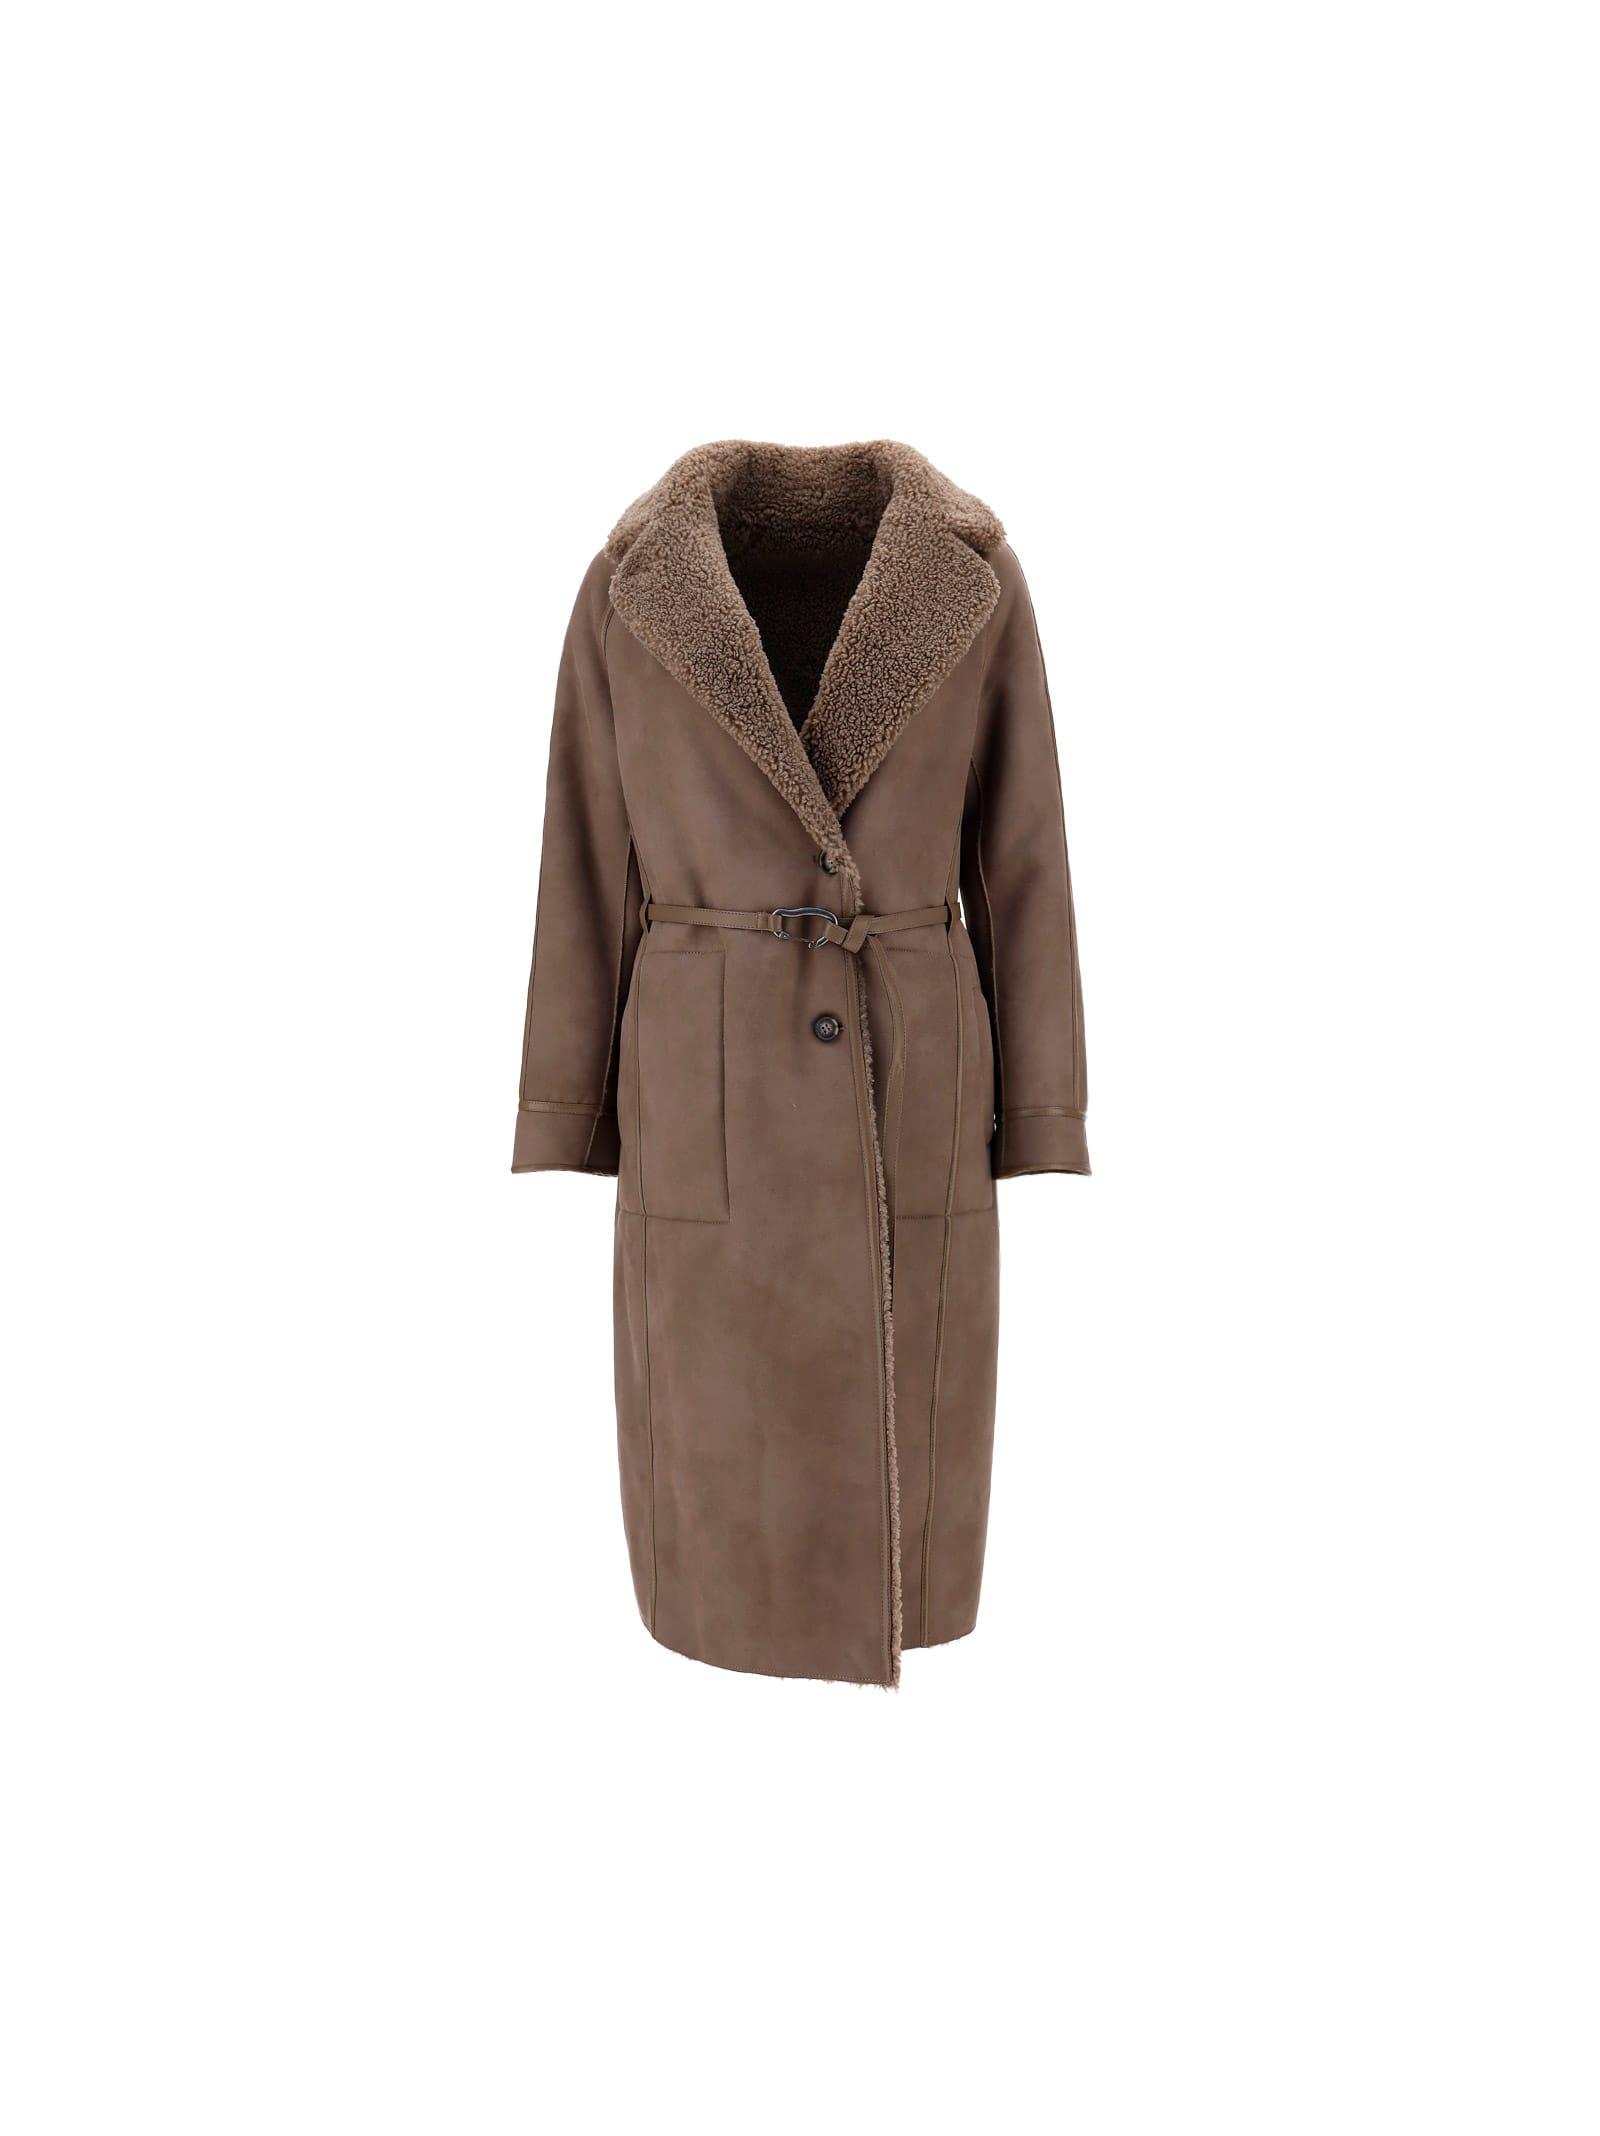 Urbancode Coat In Brown